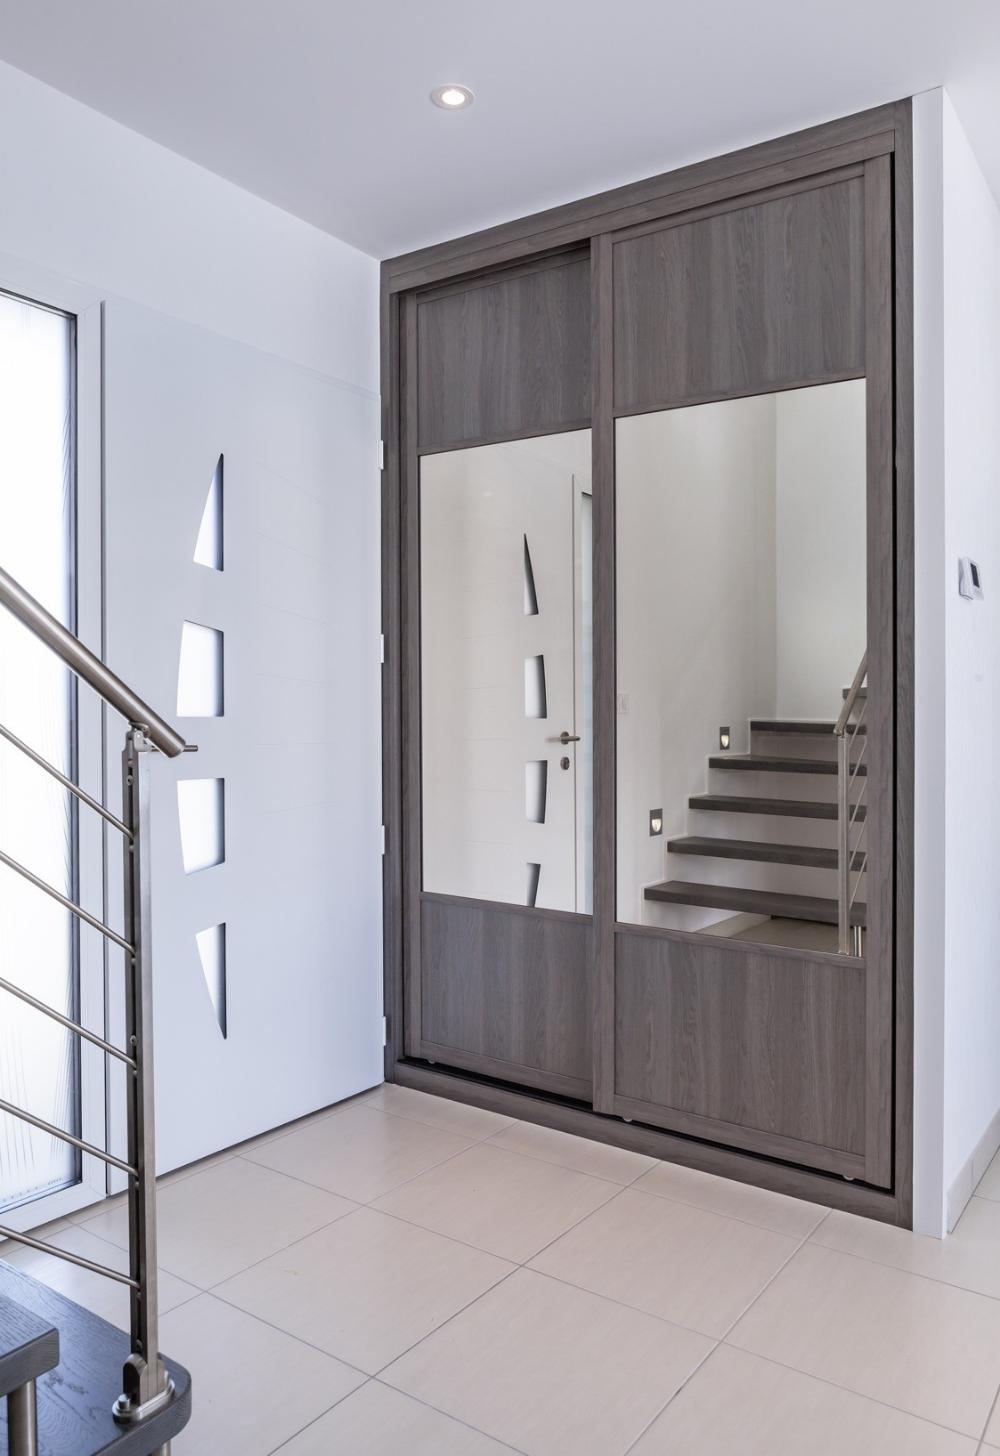 Deco Porte De Placard deco porte coulissante placard recoupable portes